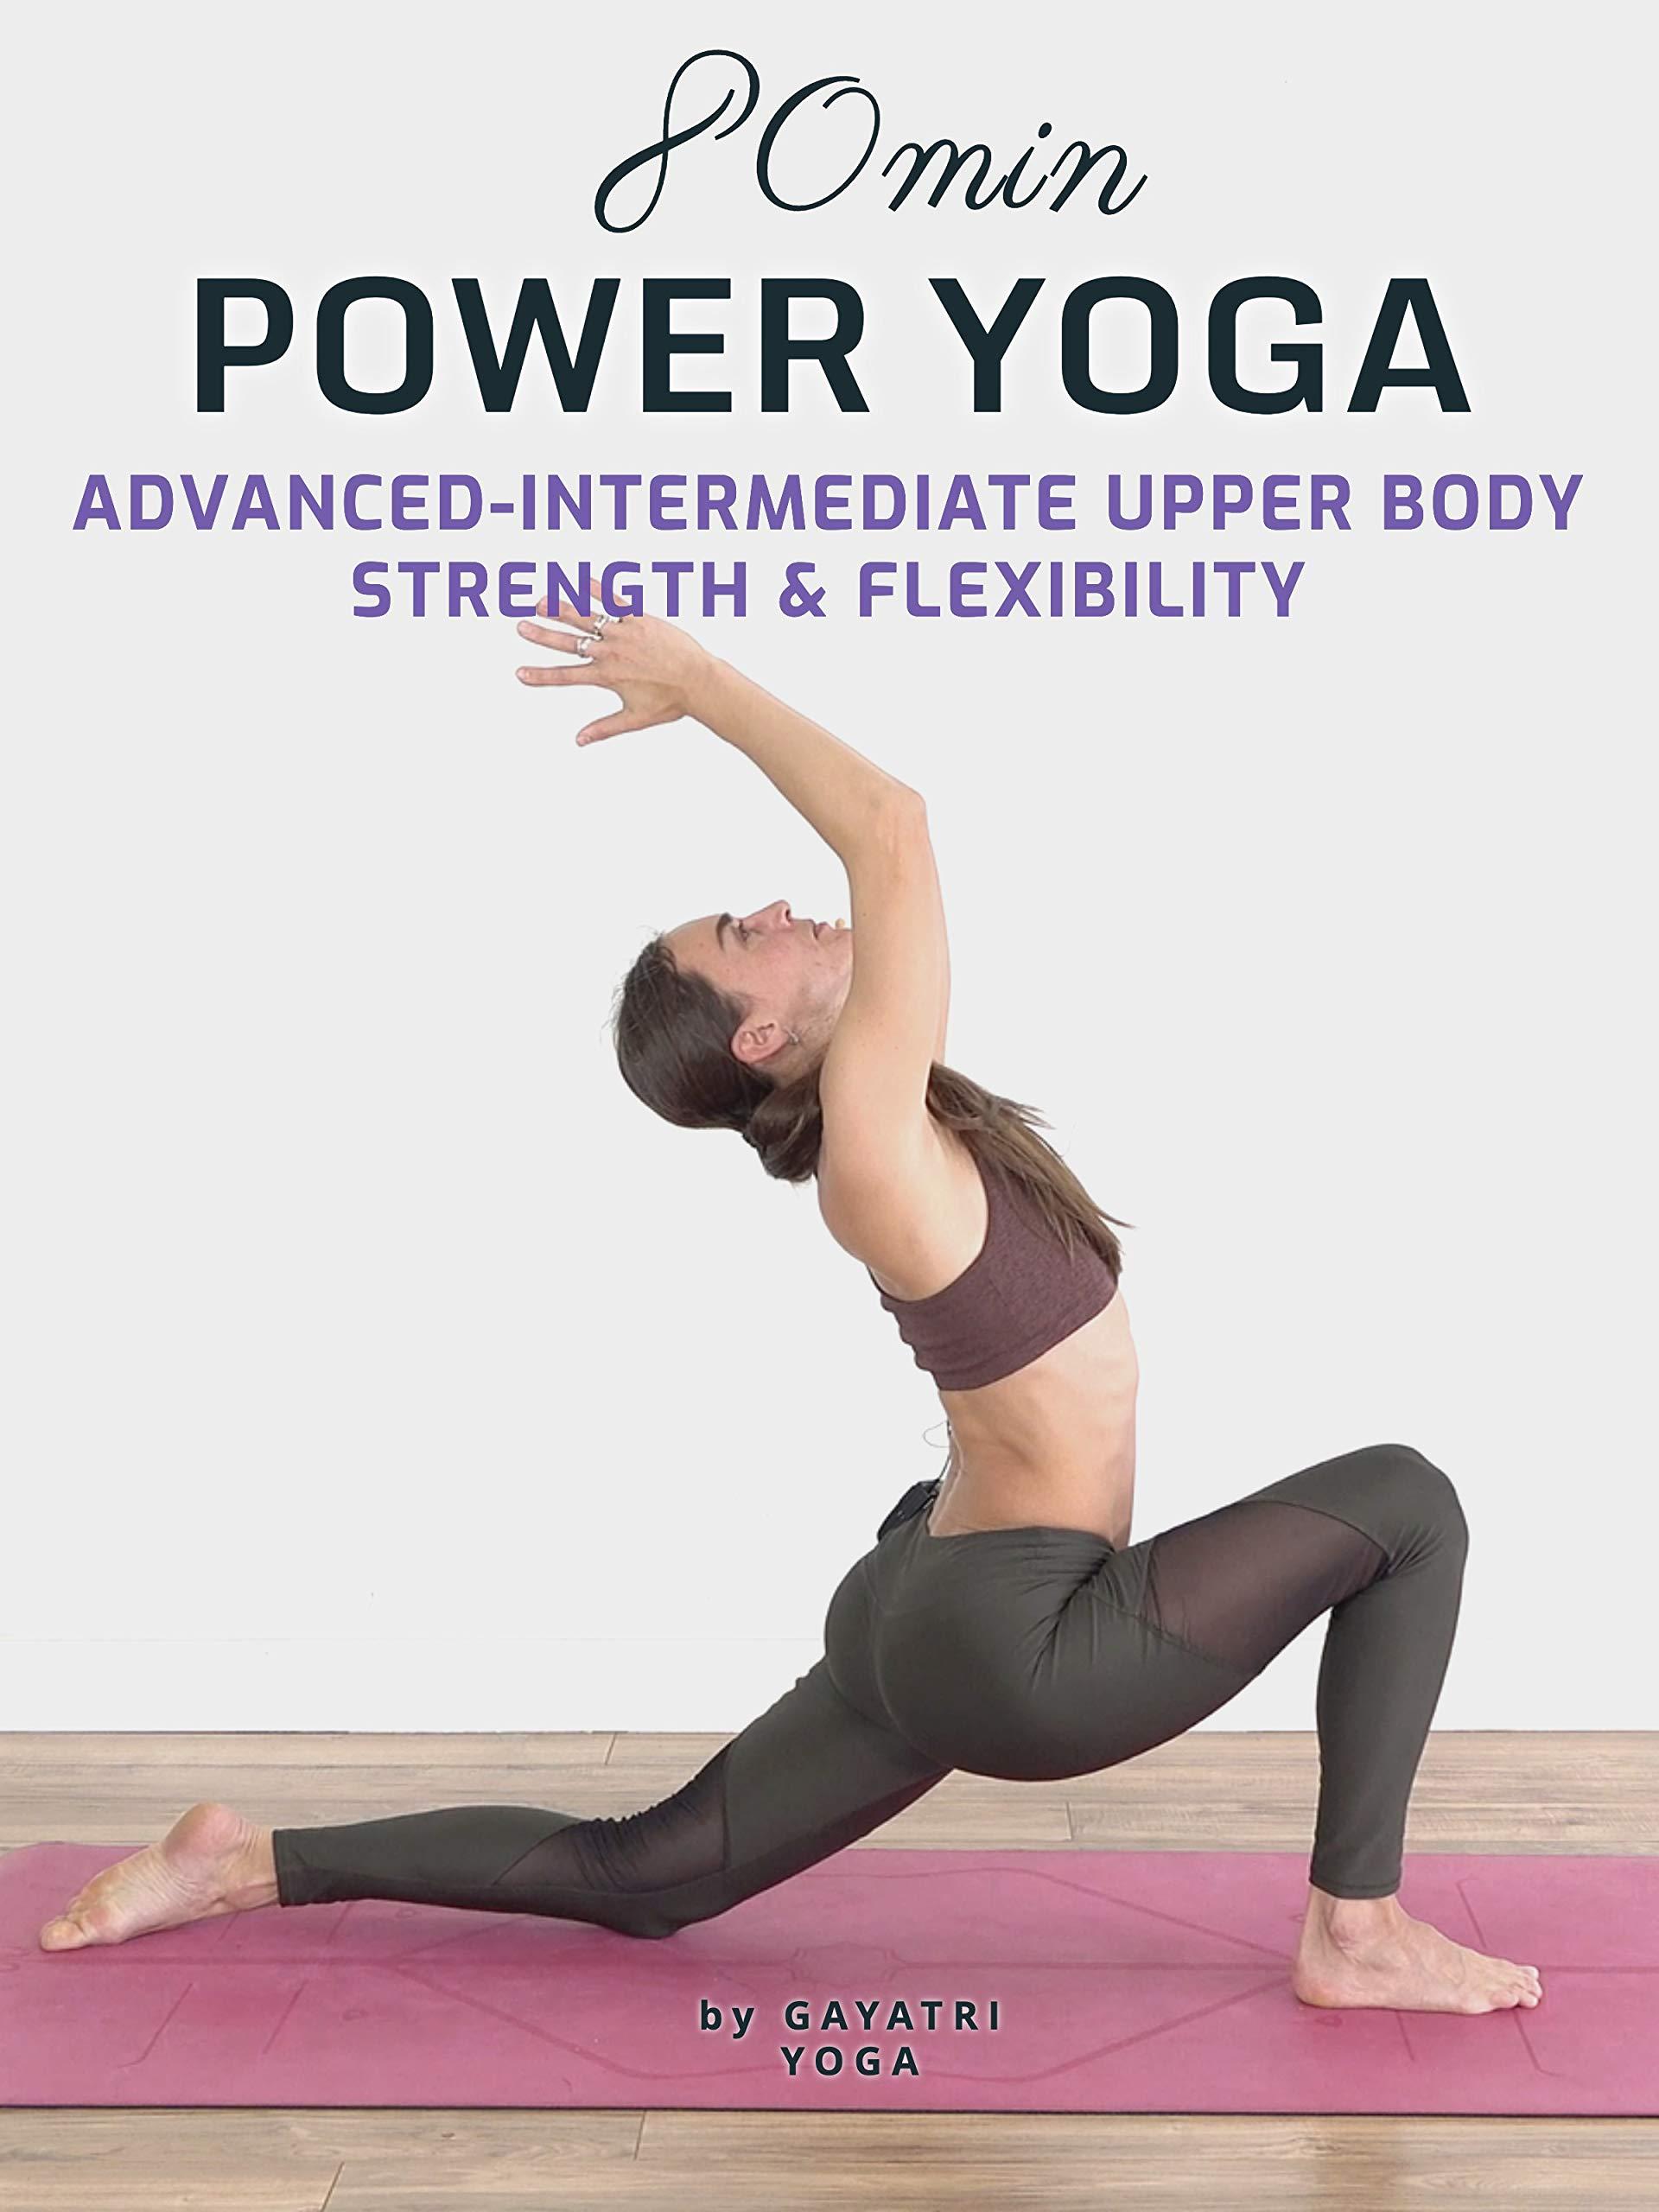 80 Min Power Yoga | Advanced - Intermediate Upper Body Strength & Flexibility - Gayatri Yoga